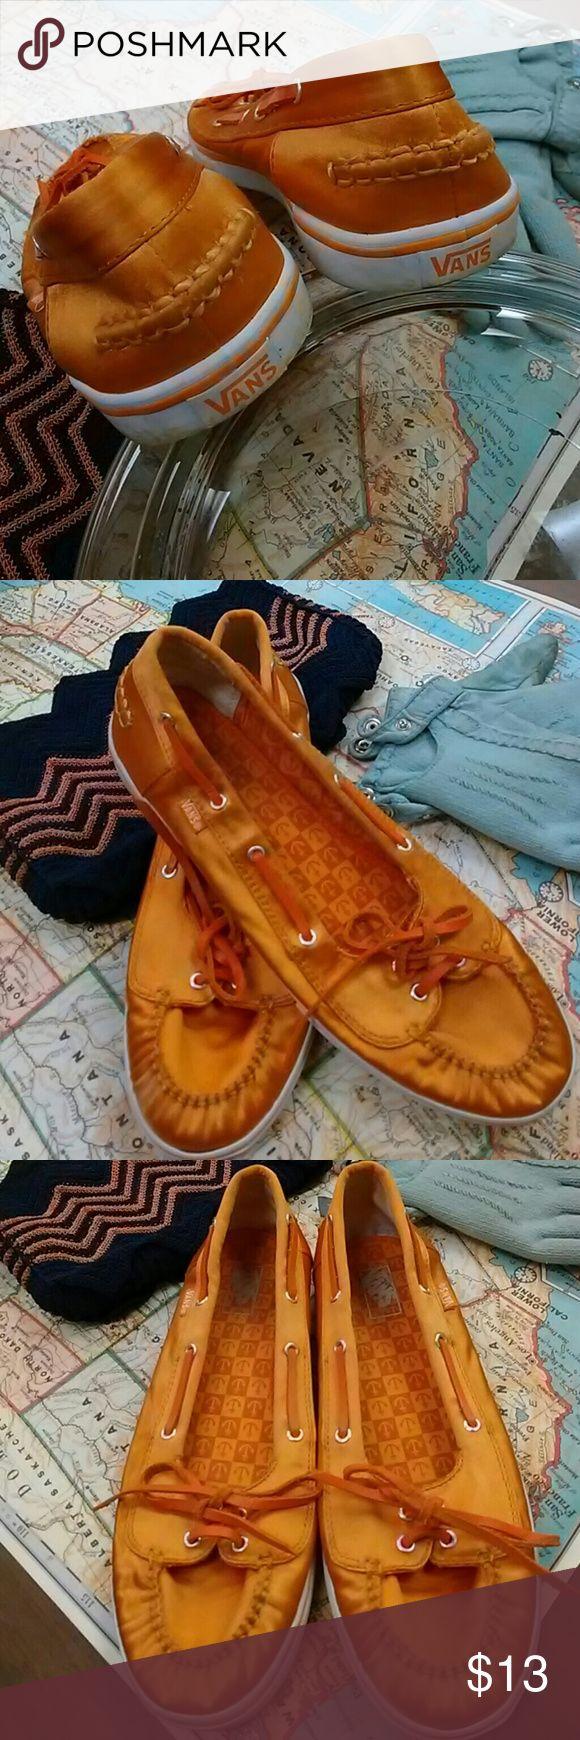 Vans Boat Shoe Style Orange Board Shoes Vans Boat Shoe Style Orange Board Shoes Slightly Used Vans Shoes Sneakers